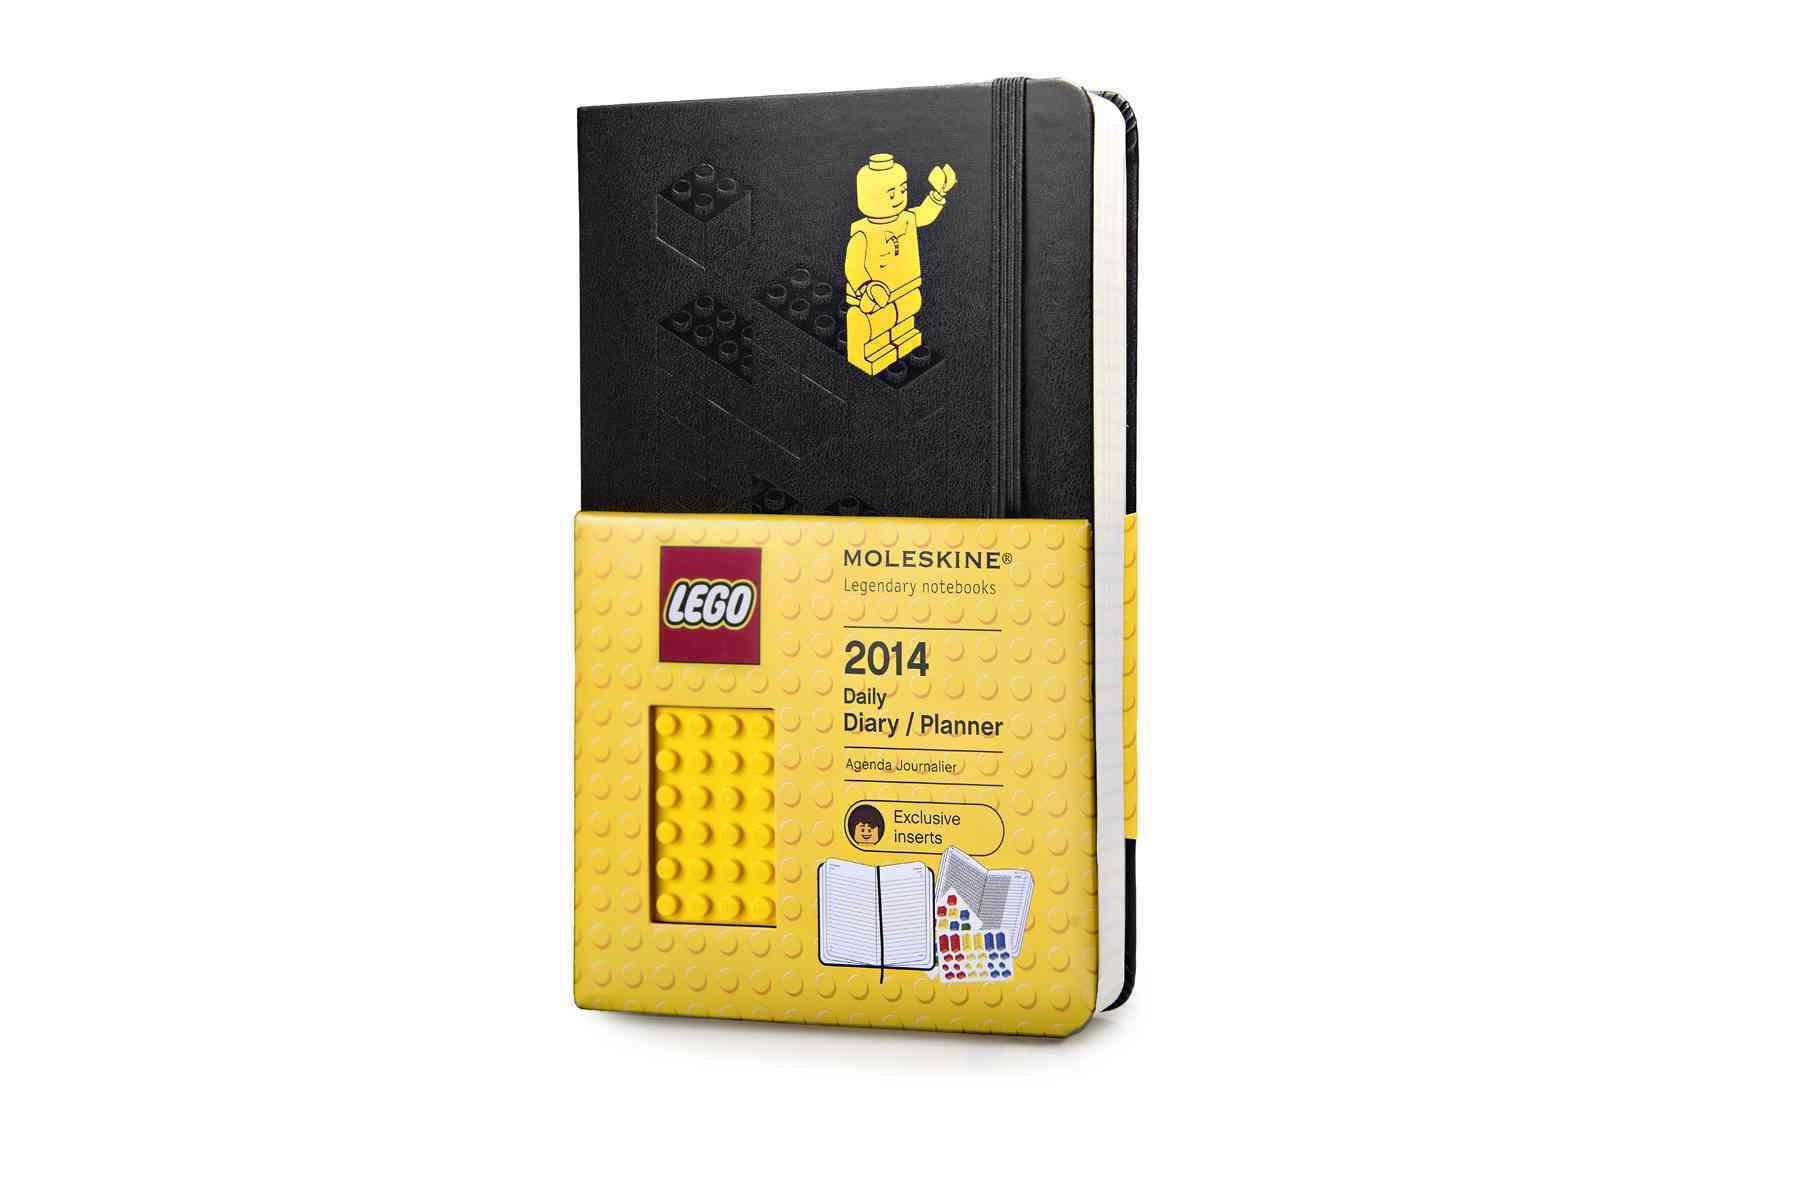 Moleskine 2014 Planner 12 Month Lego Daily Large Black (Calendar)